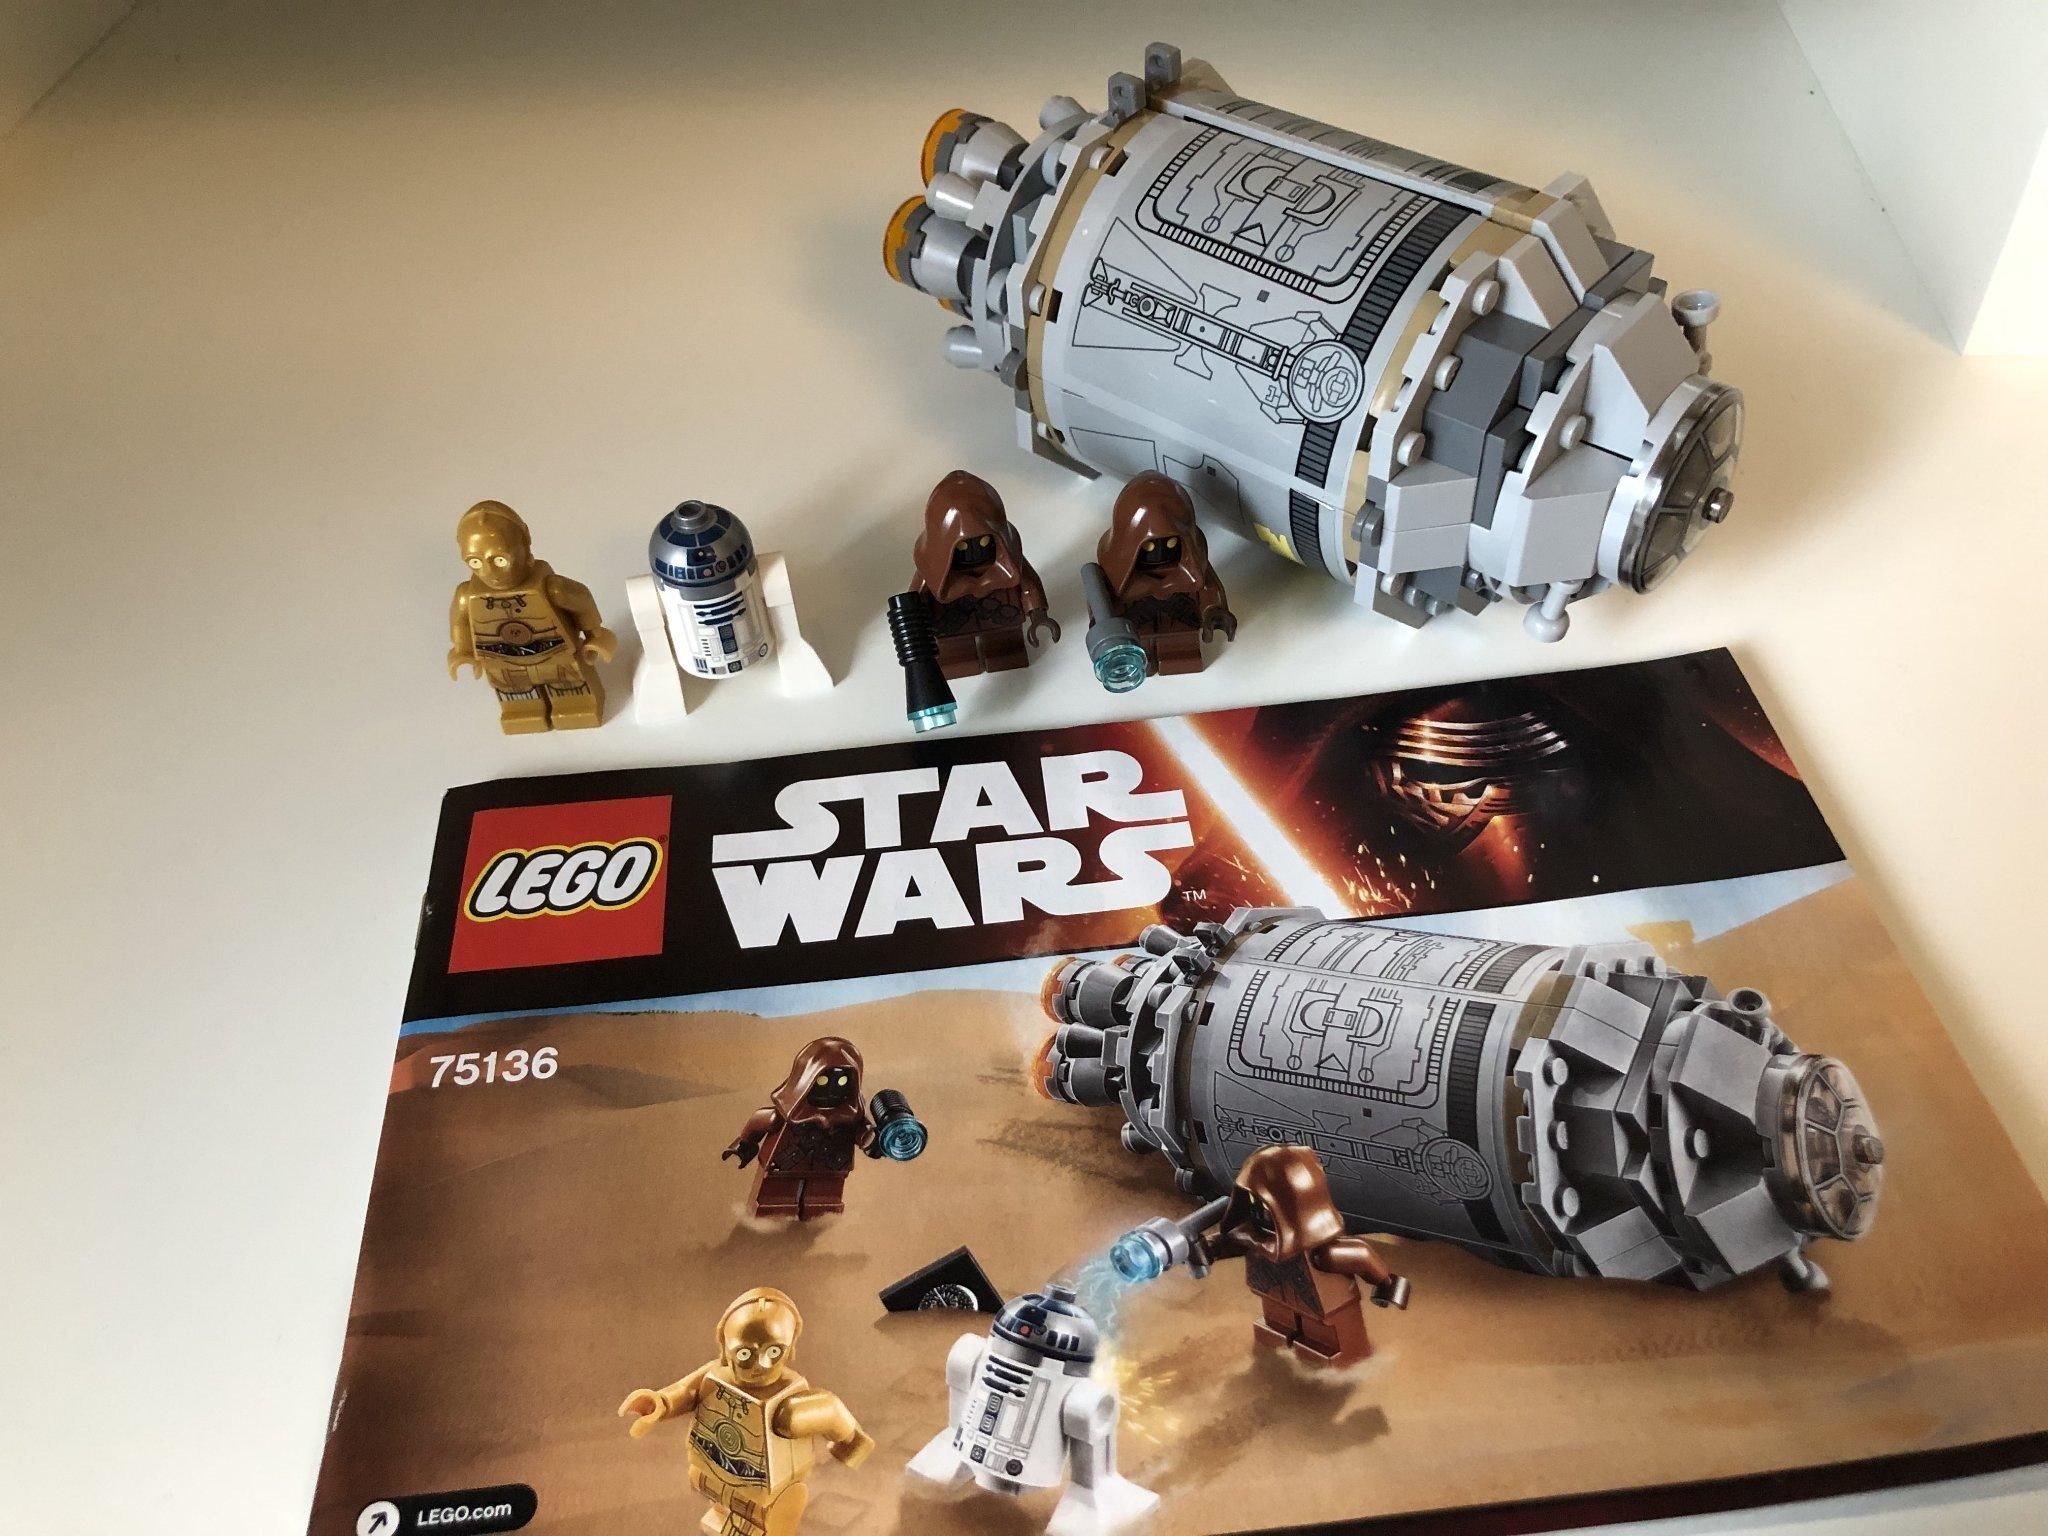 LEGO STAR WARS Droid Escape Pod 75136C-3PO R2-D2 Jawas